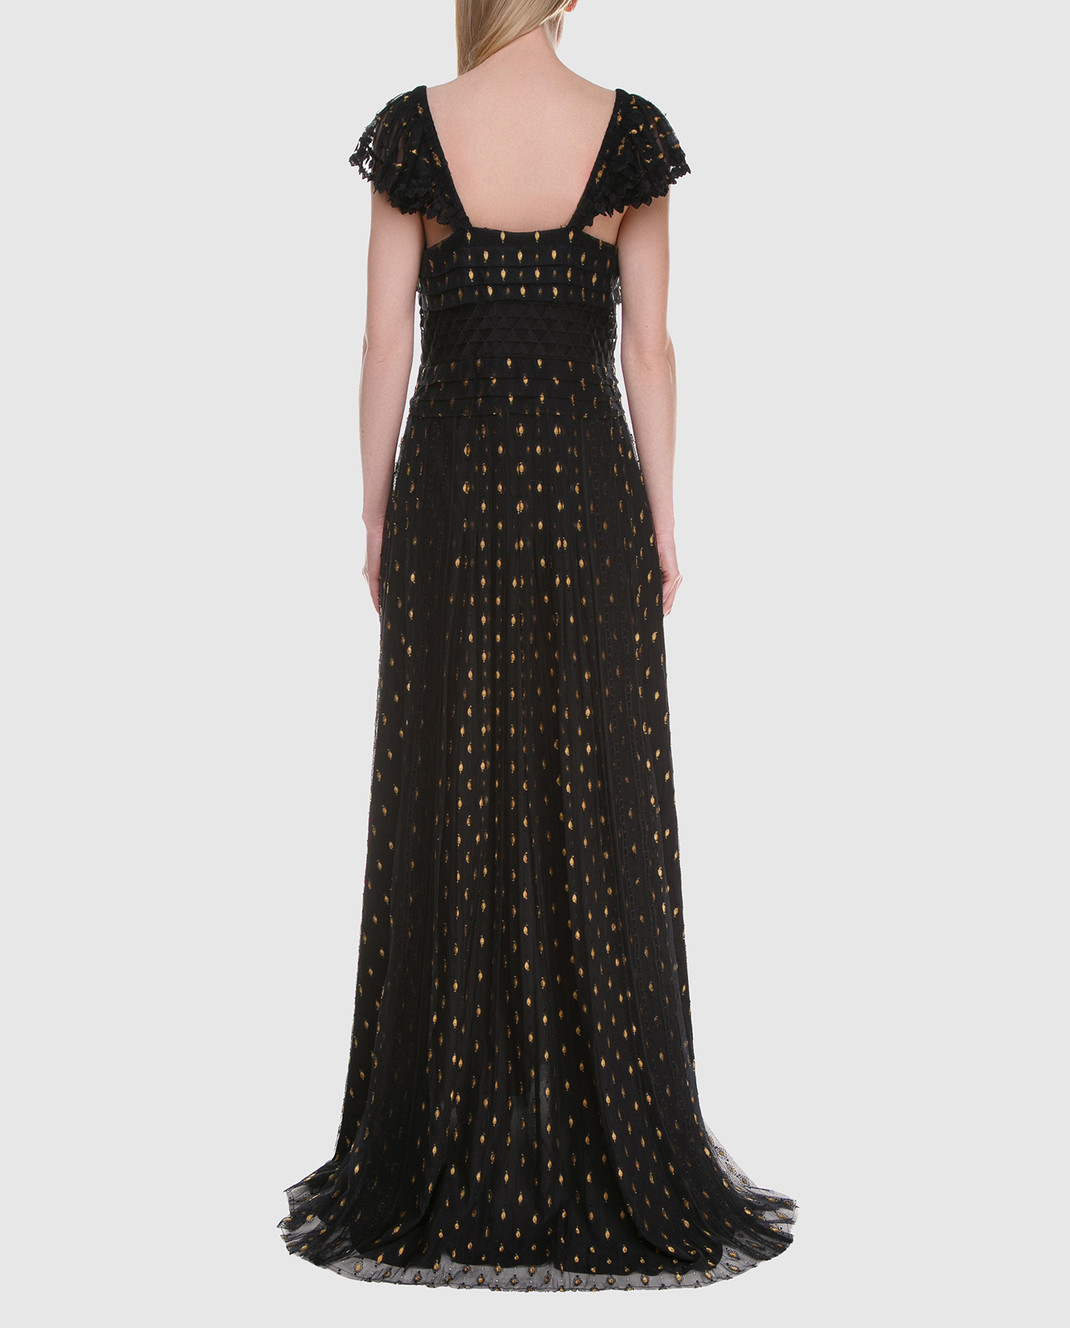 Philosophy di Lorenzo Serafini Вечернее платье A0417 изображение 4